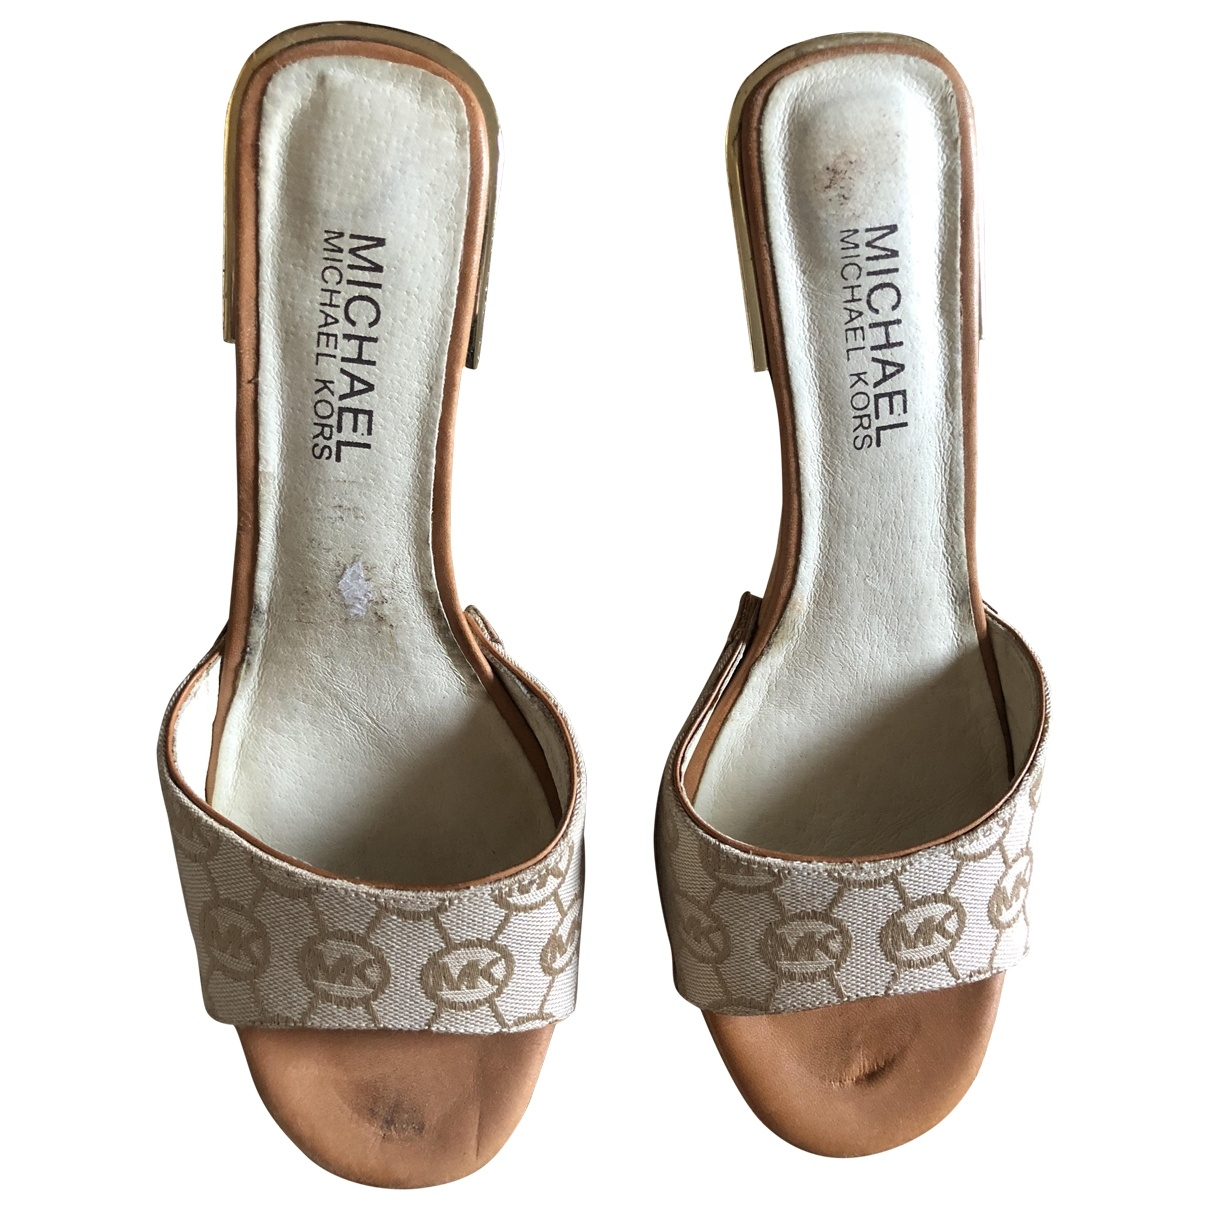 Michael Kors \N Beige Cloth Sandals for Women 36 EU